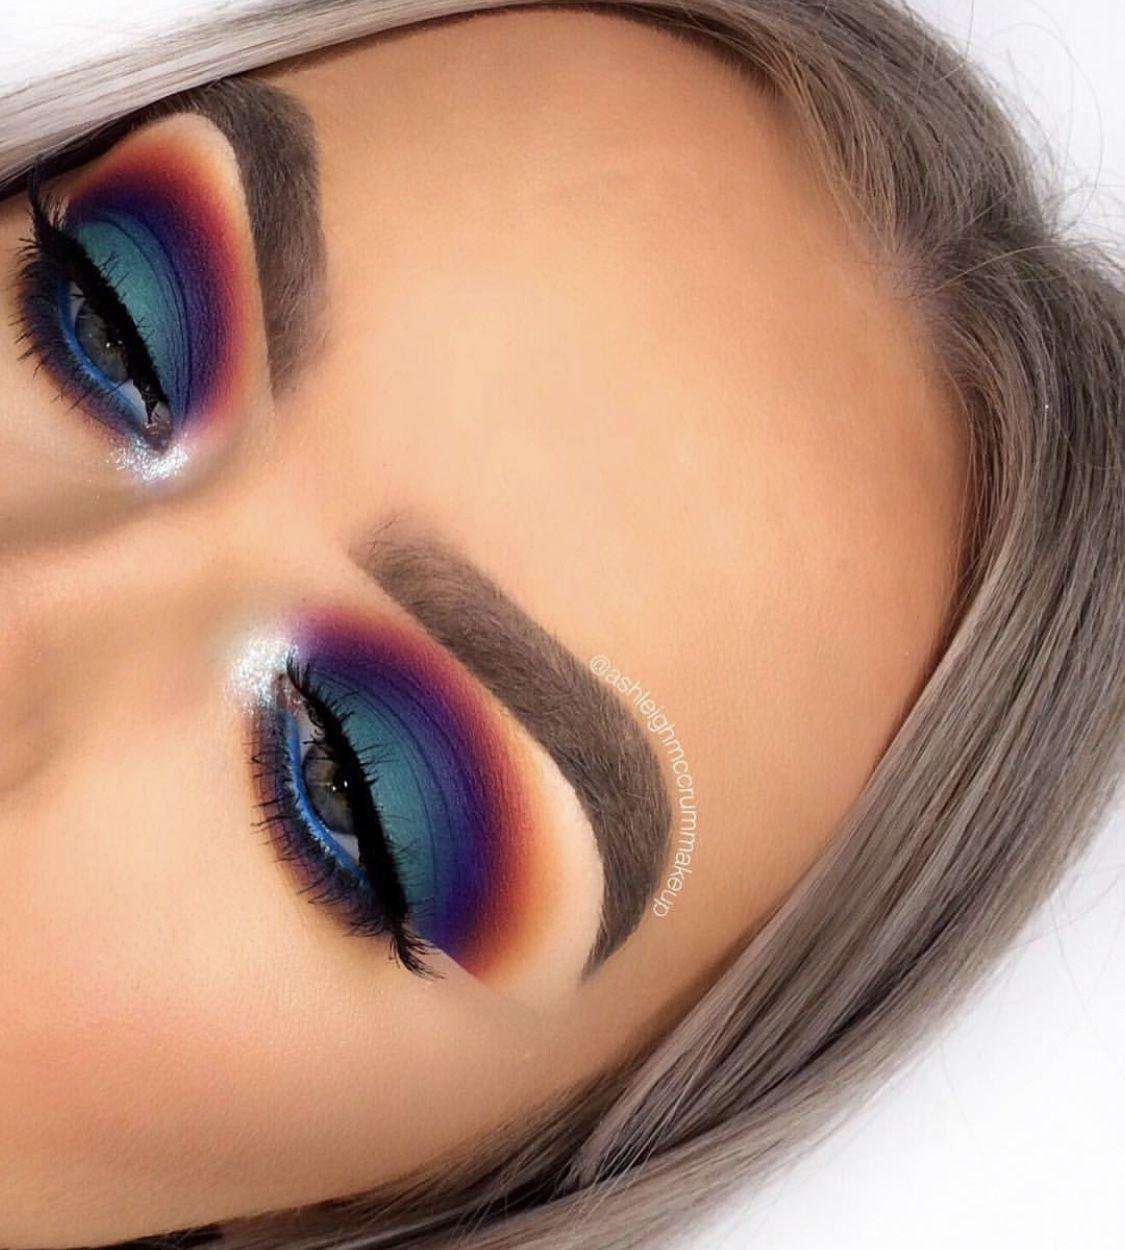 Pin by Lexi Jean on Beauty Eyeshadow makeup, Eye makeup